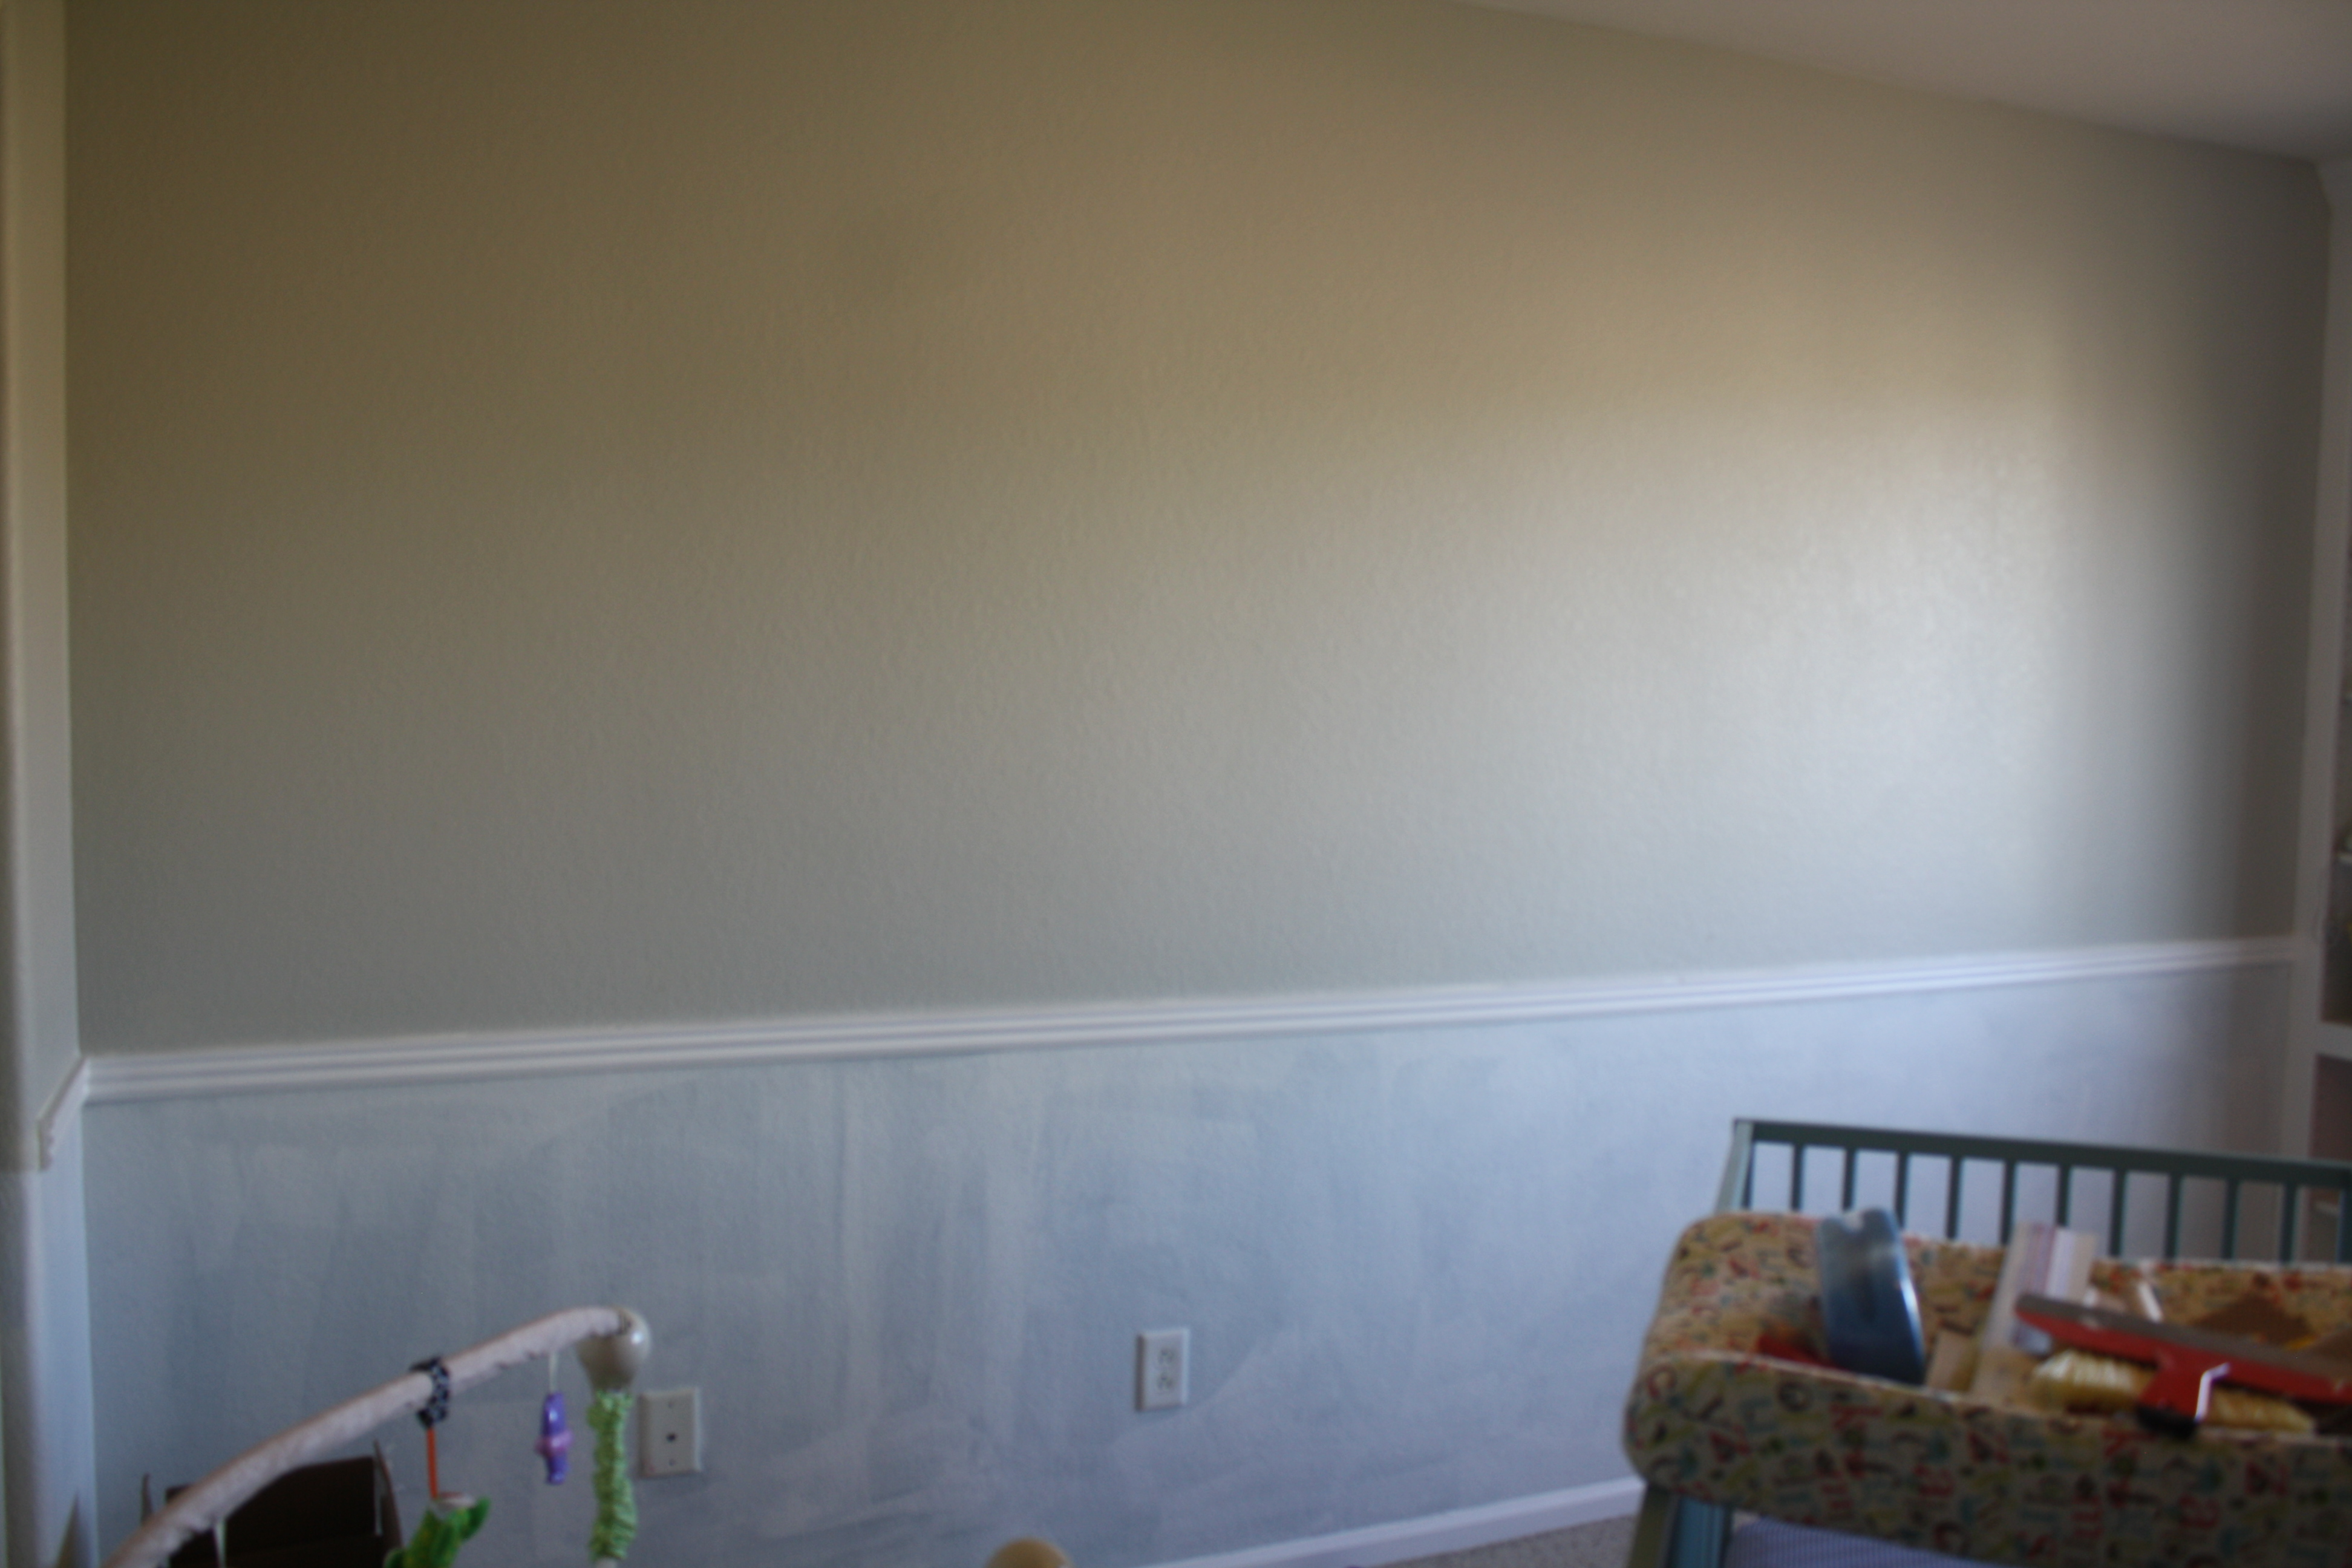 allen roth beadboard wallpaper wallpapersafari